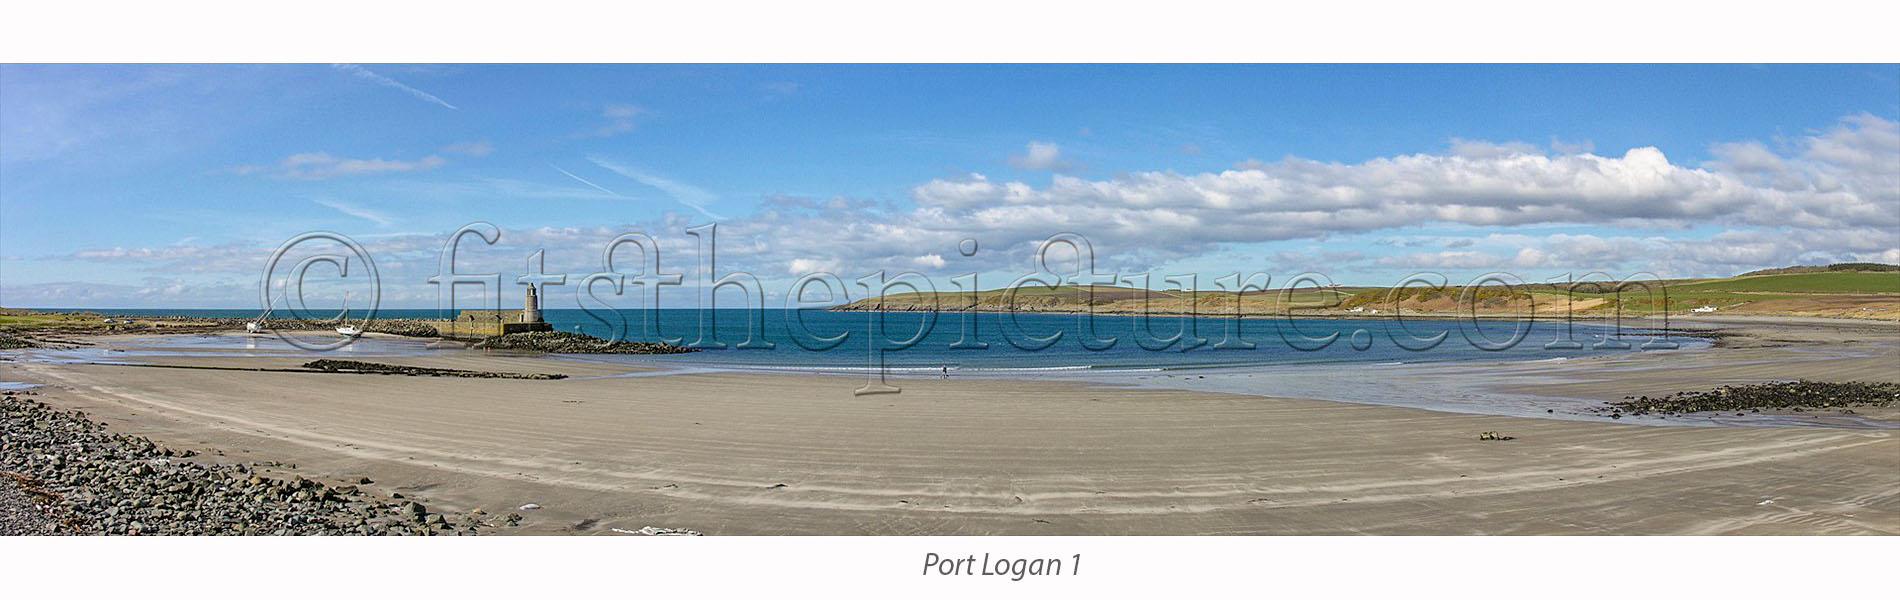 port_logan_1.jpg